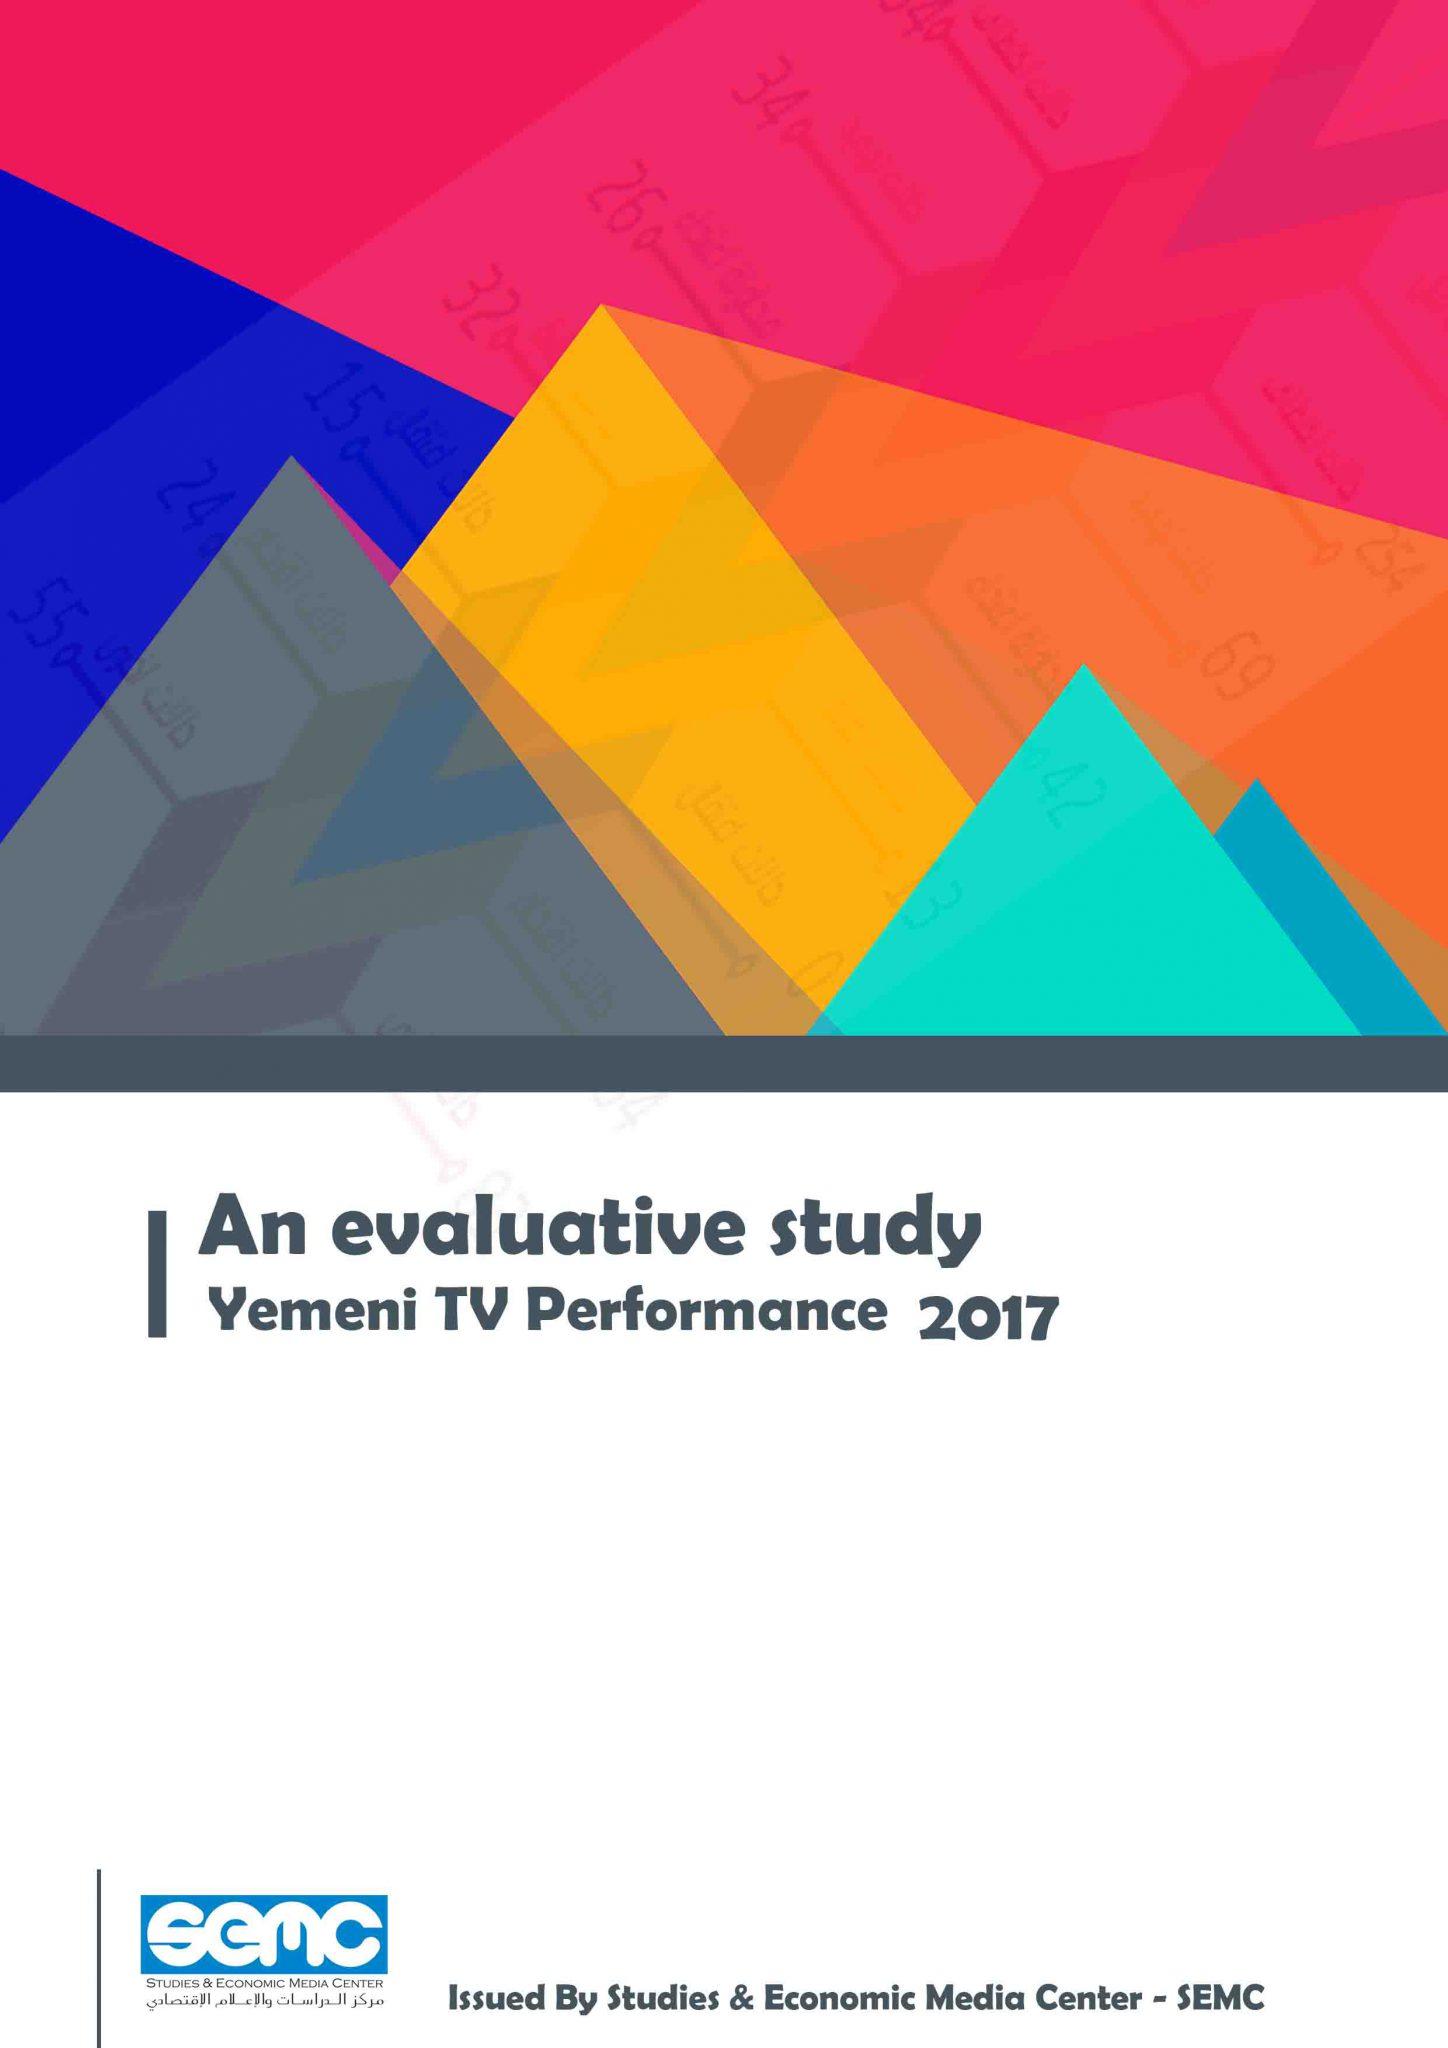 An Evaluative Study Yemeni TV Performance 2017 ( English )